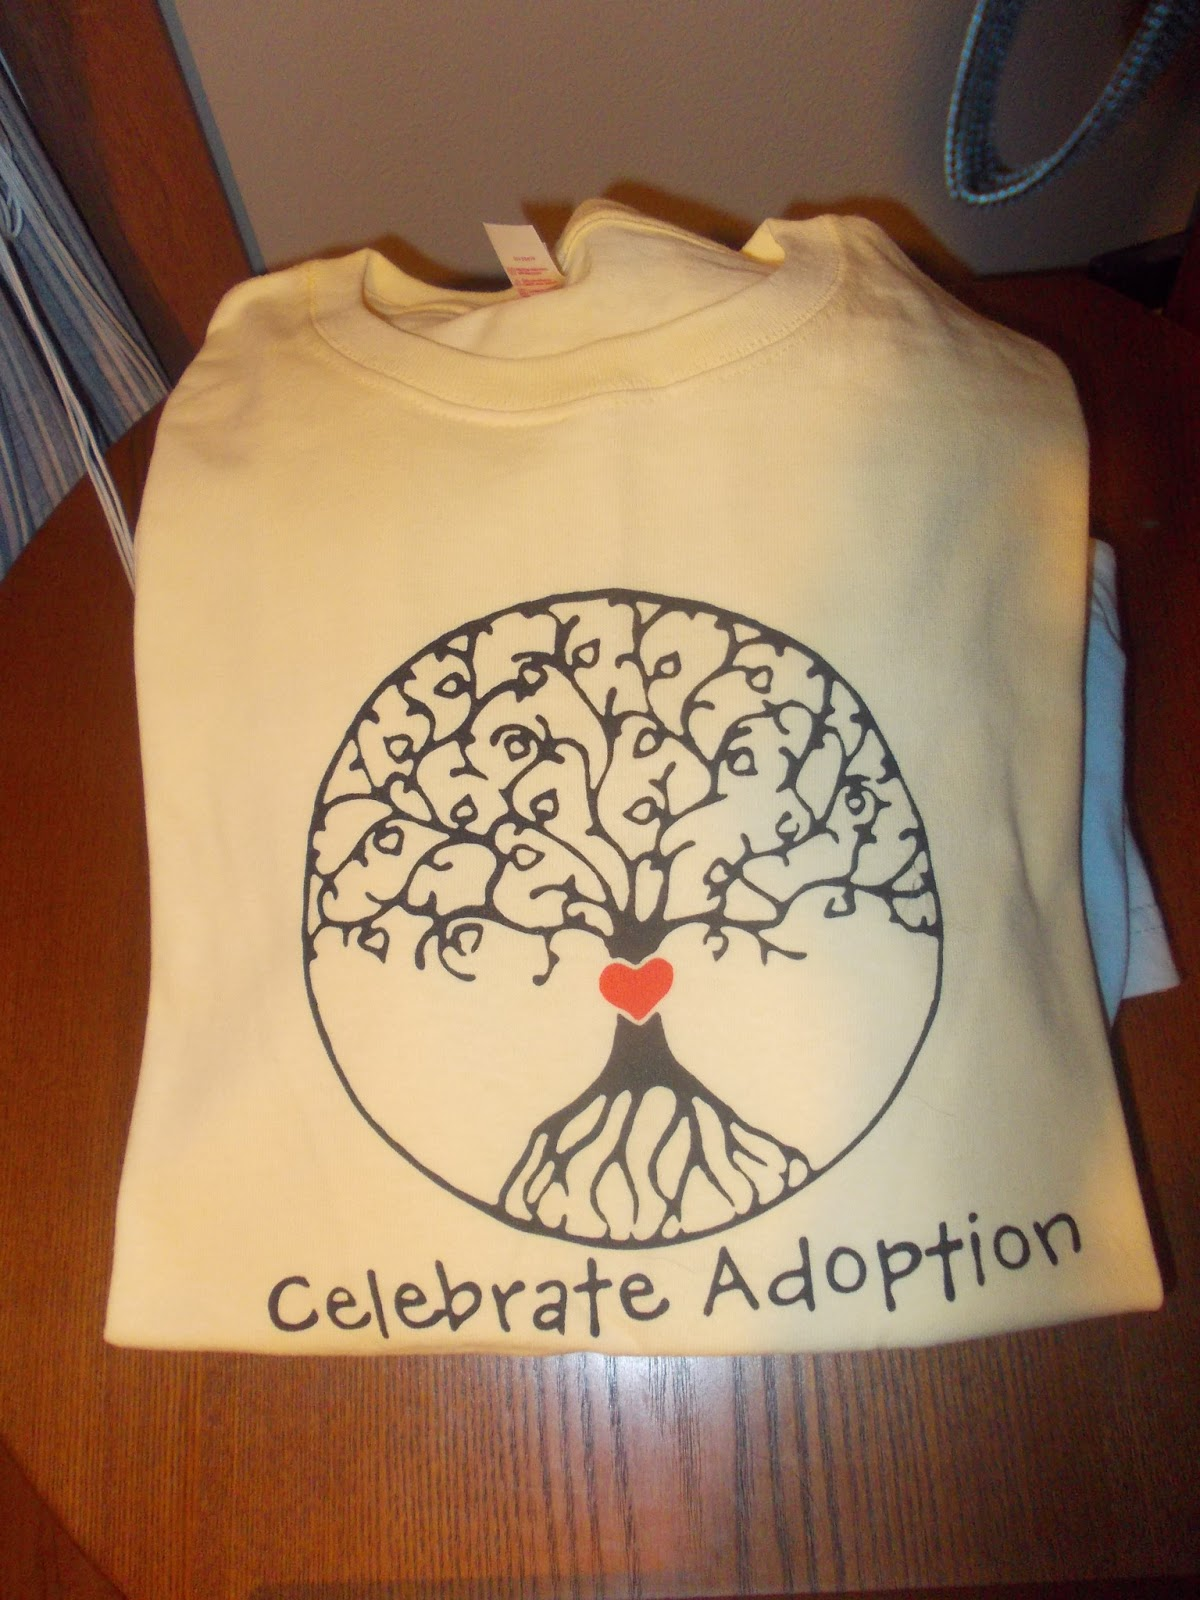 Adoption fundraiser for Adoption fundraiser t shirts